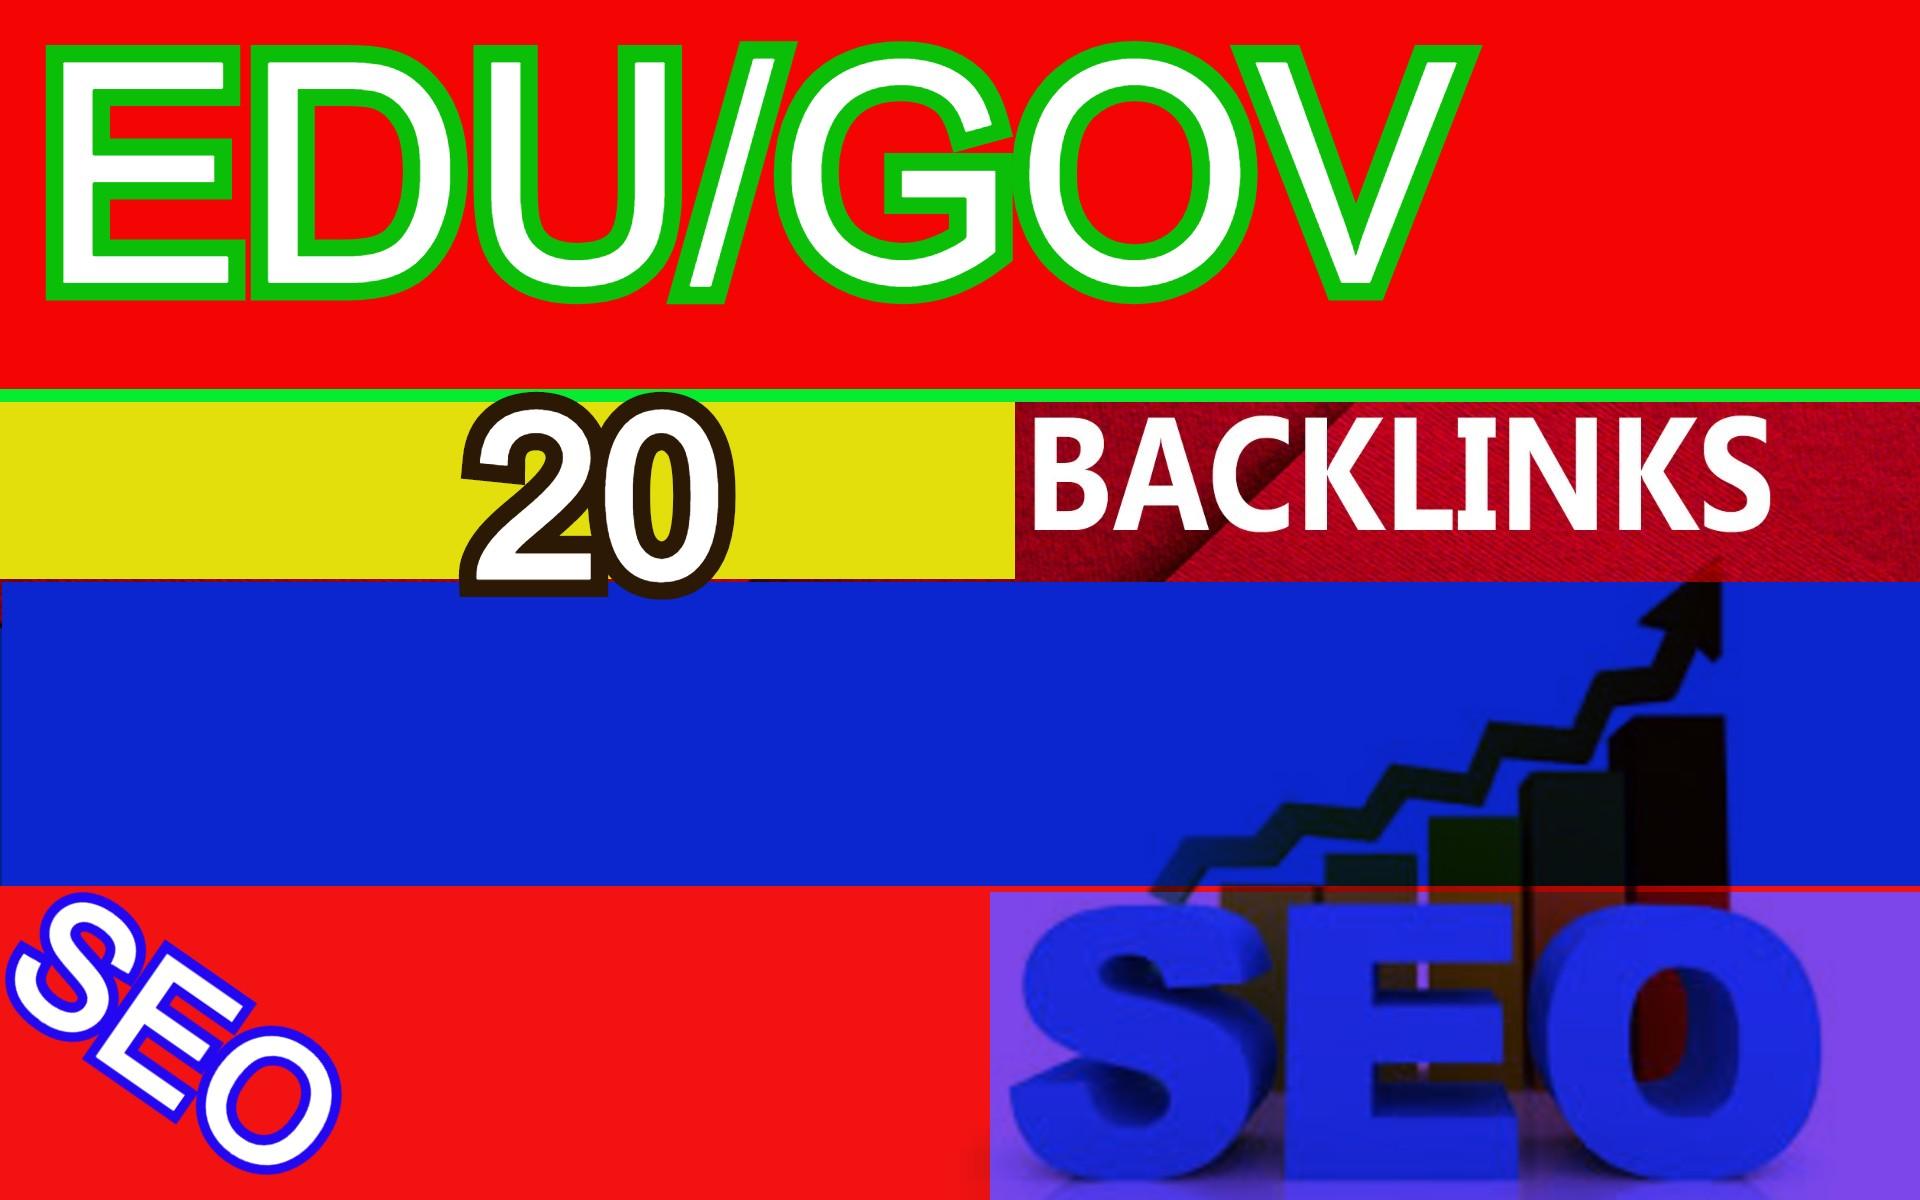 20 EDU/GOV backlinks using some Biggest PR9-2 Authority Domains